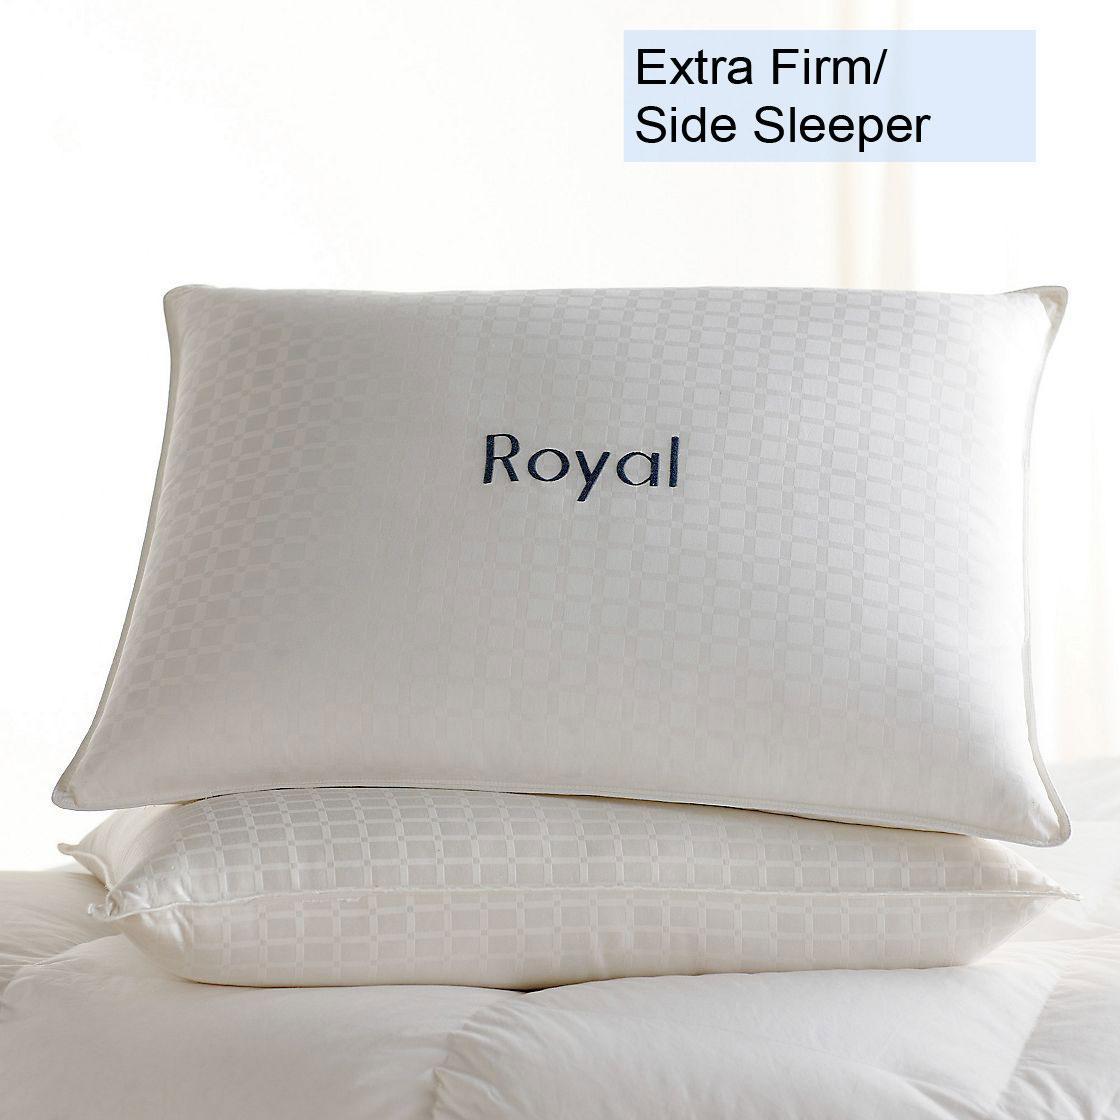 Legends® Royal Down Pillow – Extra- Firm, Side Sleeper